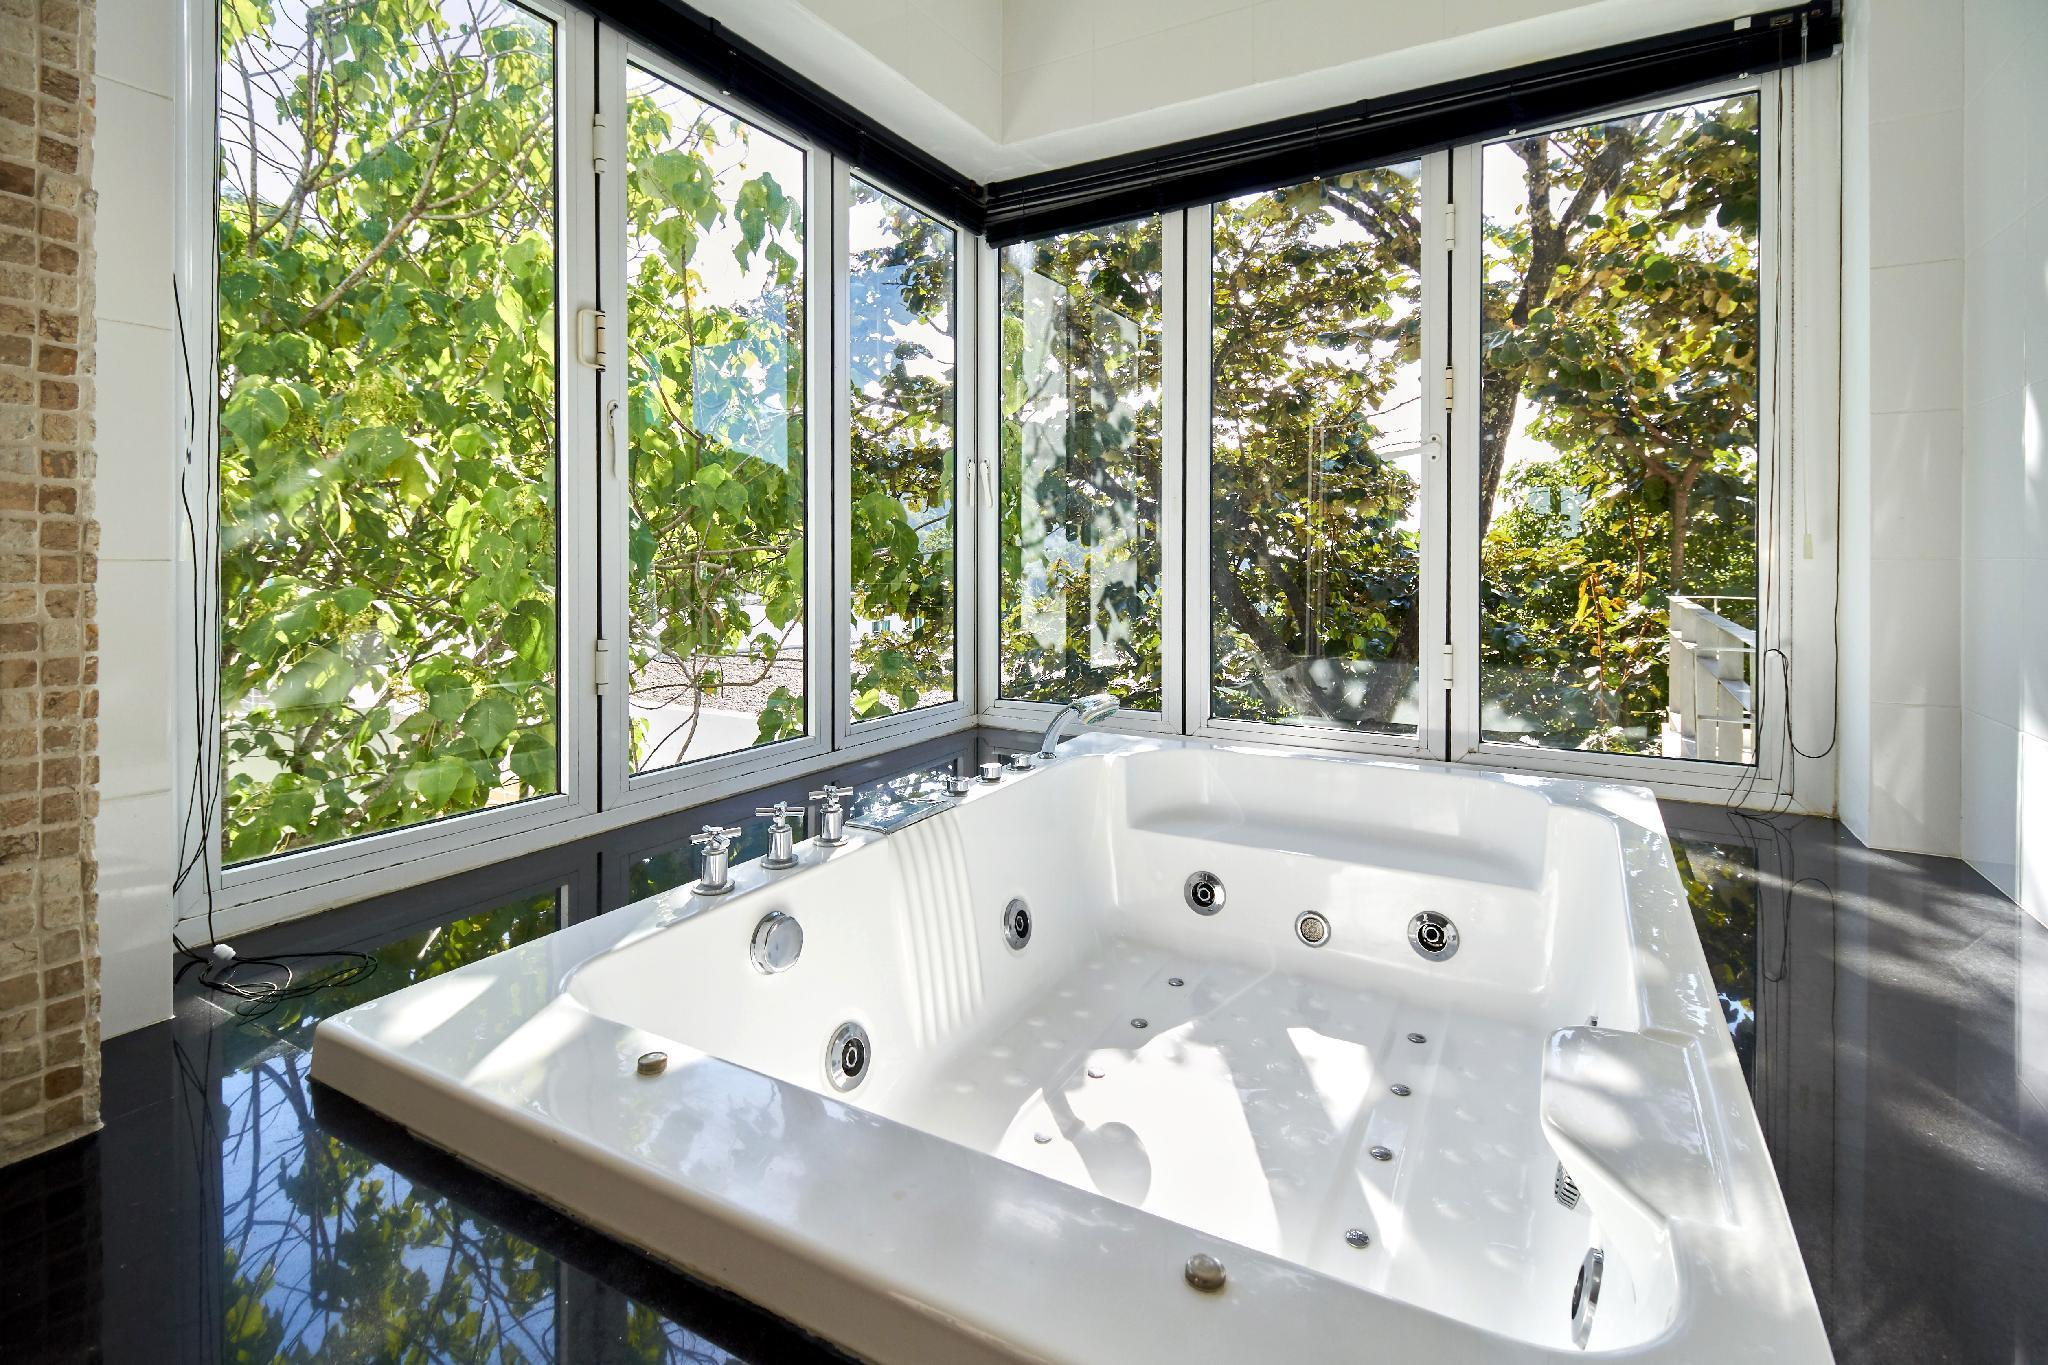 Villa Ginborn - 5 bedroom poolvilla with seaview Villa Ginborn - 5 bedroom poolvilla with seaview